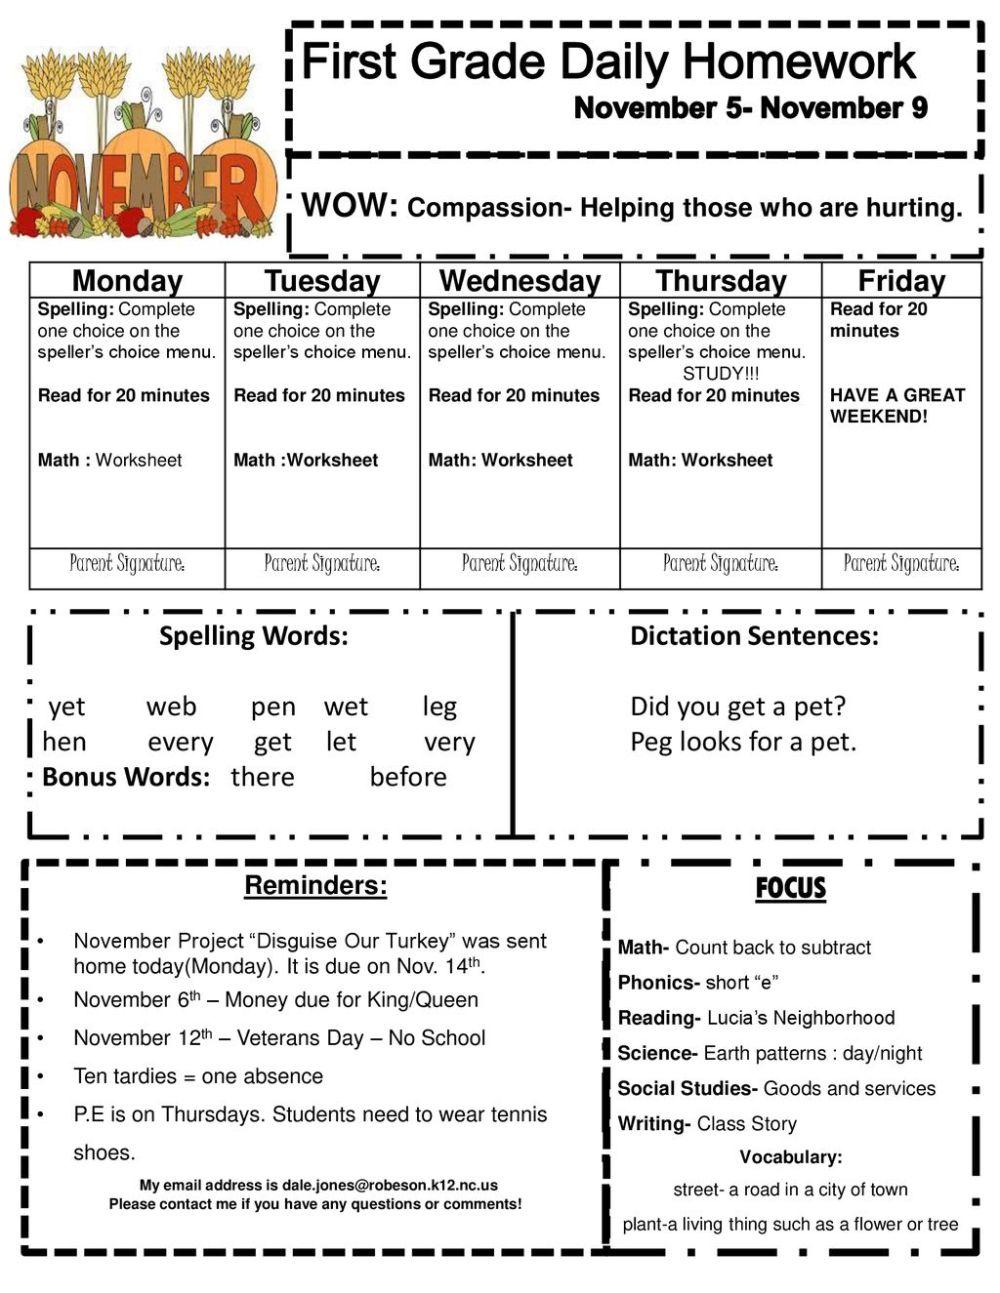 medium resolution of First Grade Daily Homework November 5- November 9 - ppt download